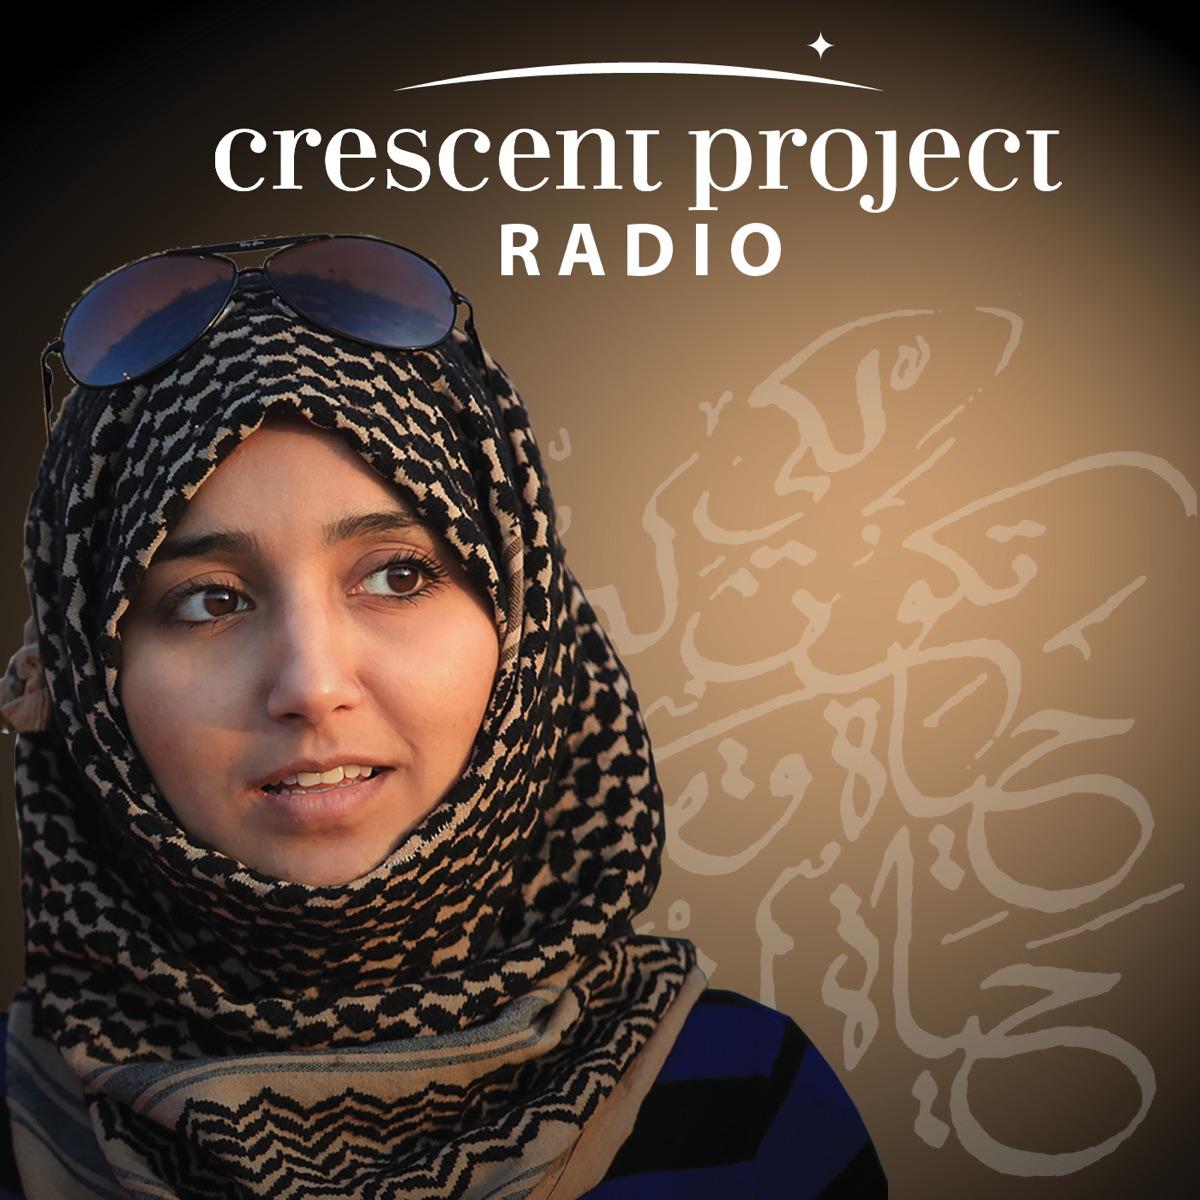 Crescent Project Radio